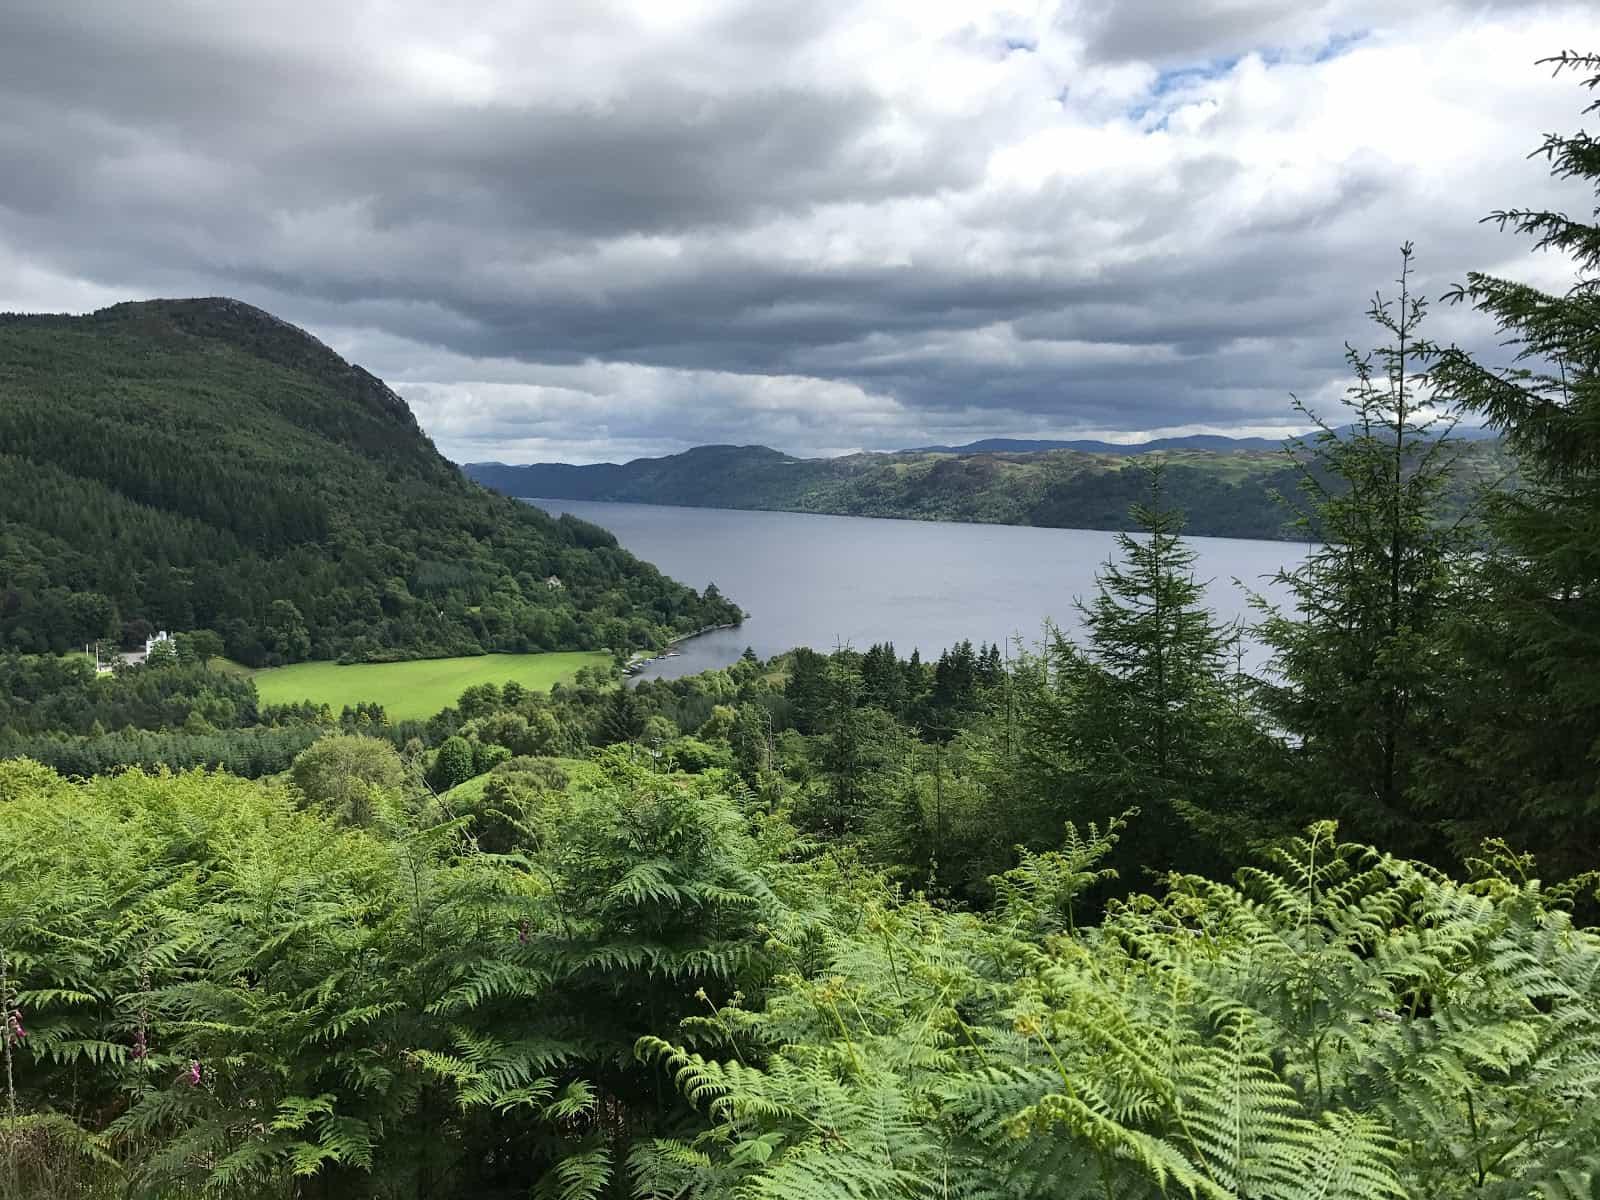 Trail to Invermoriston, Scotland hiking holidays